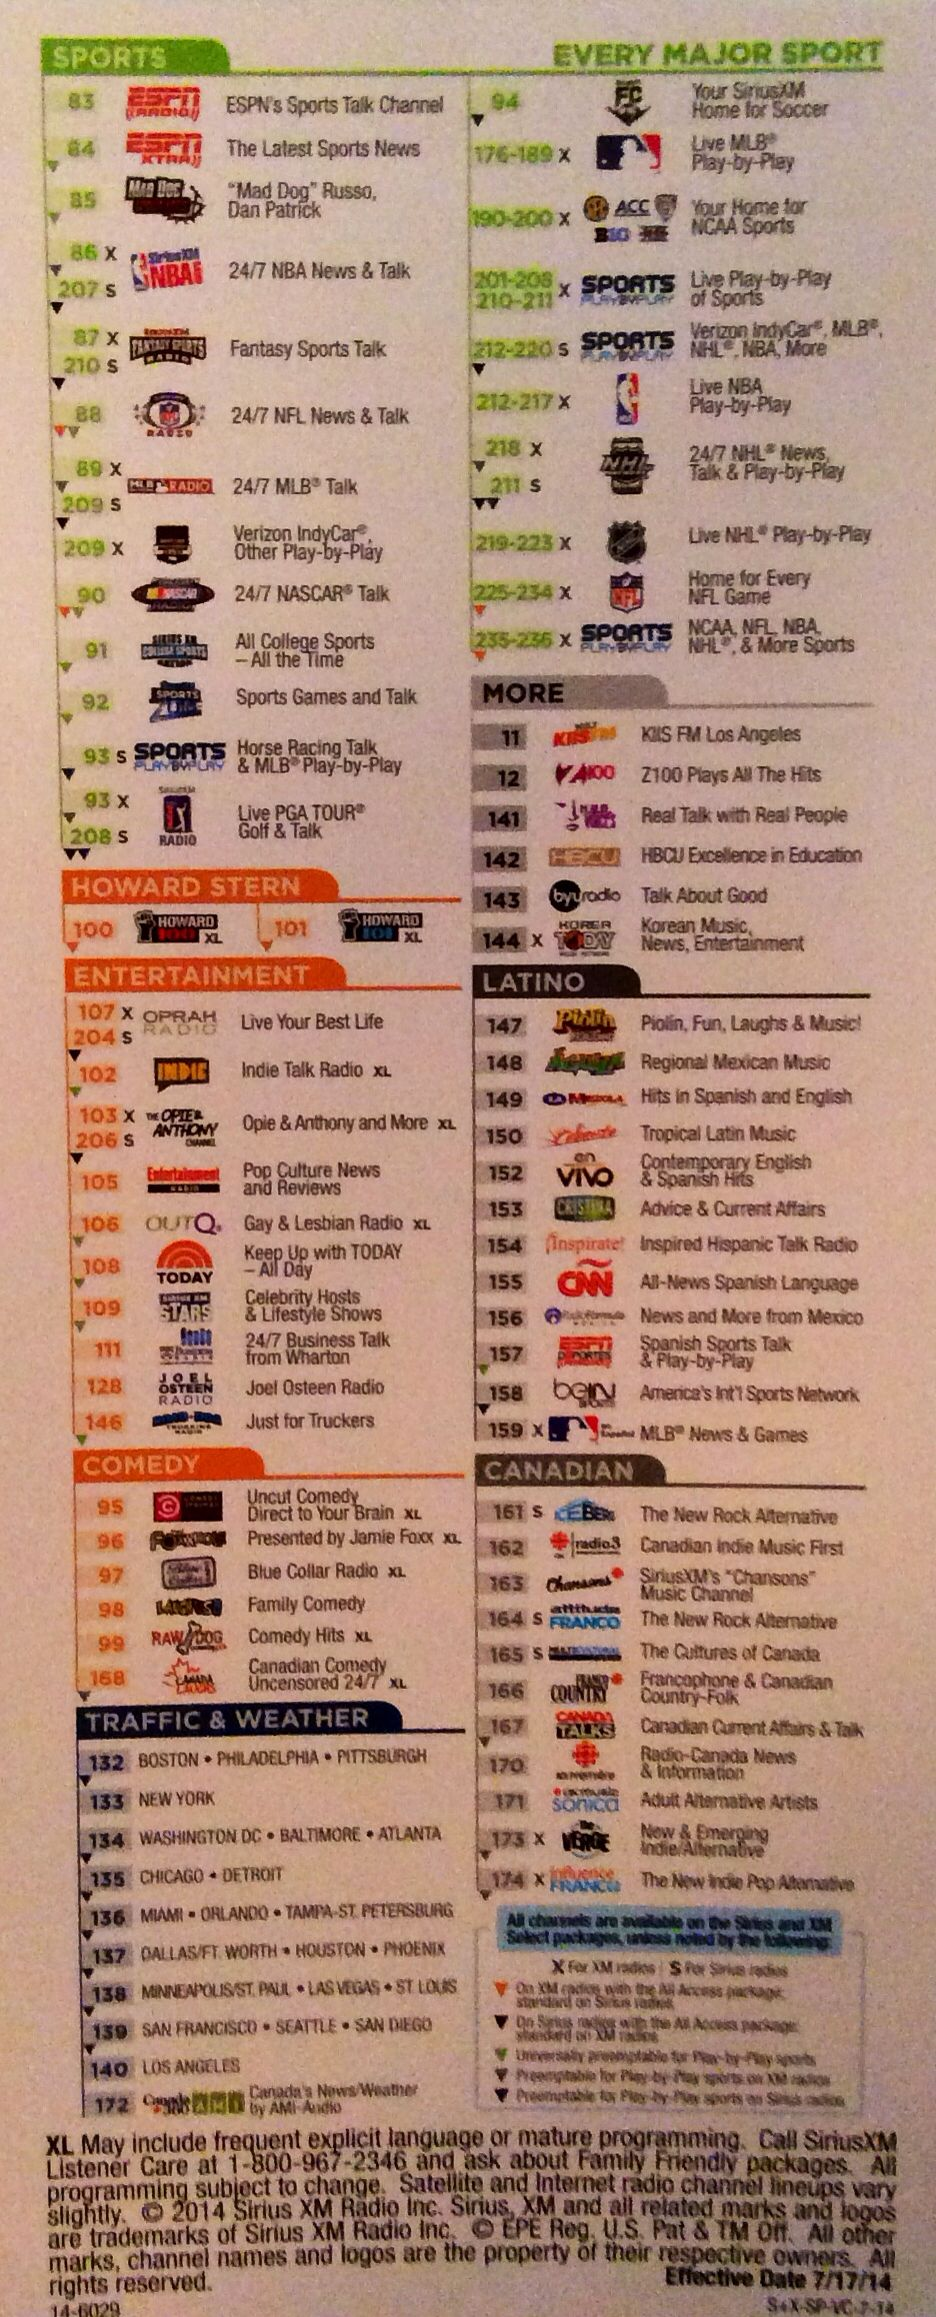 Nfl Schedule Channel Guide Siriusxm >> Sirius Xm Satellite Radio Channel Lineup Siriusxm Com